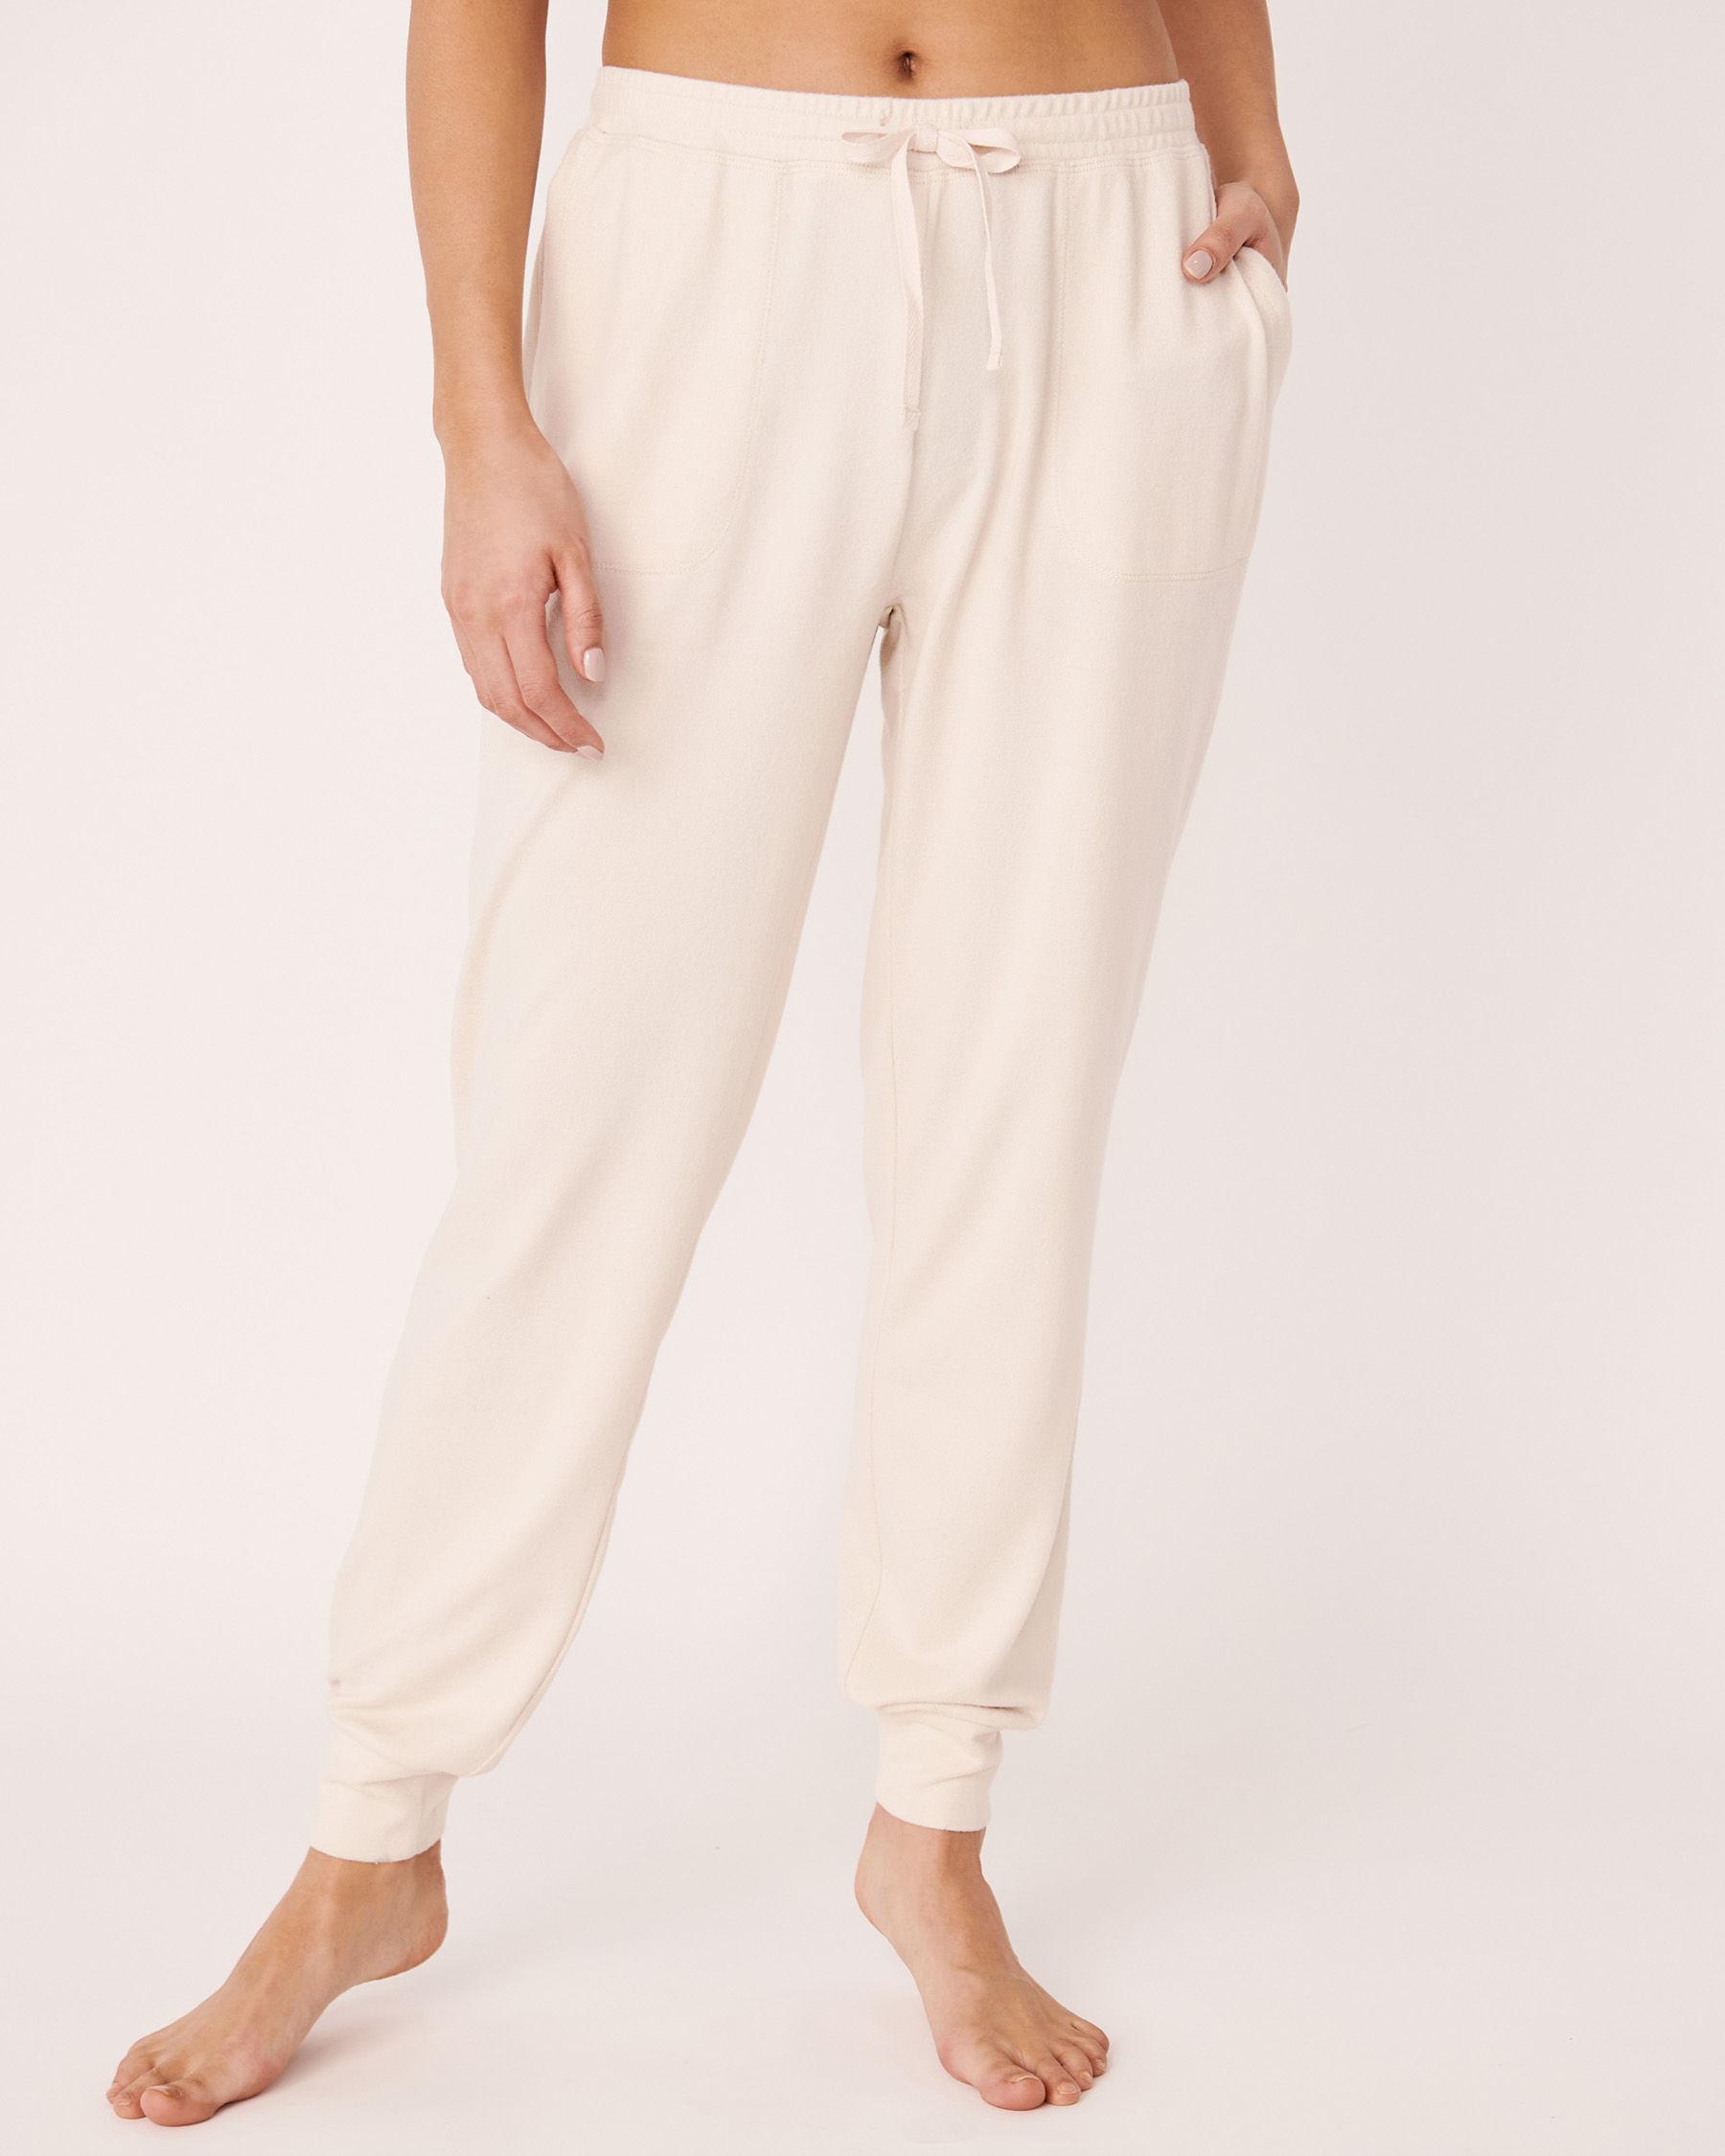 LA VIE EN ROSE Recycled Fibers Fitted Pyjama Pant Grey mix 40200129 - View1